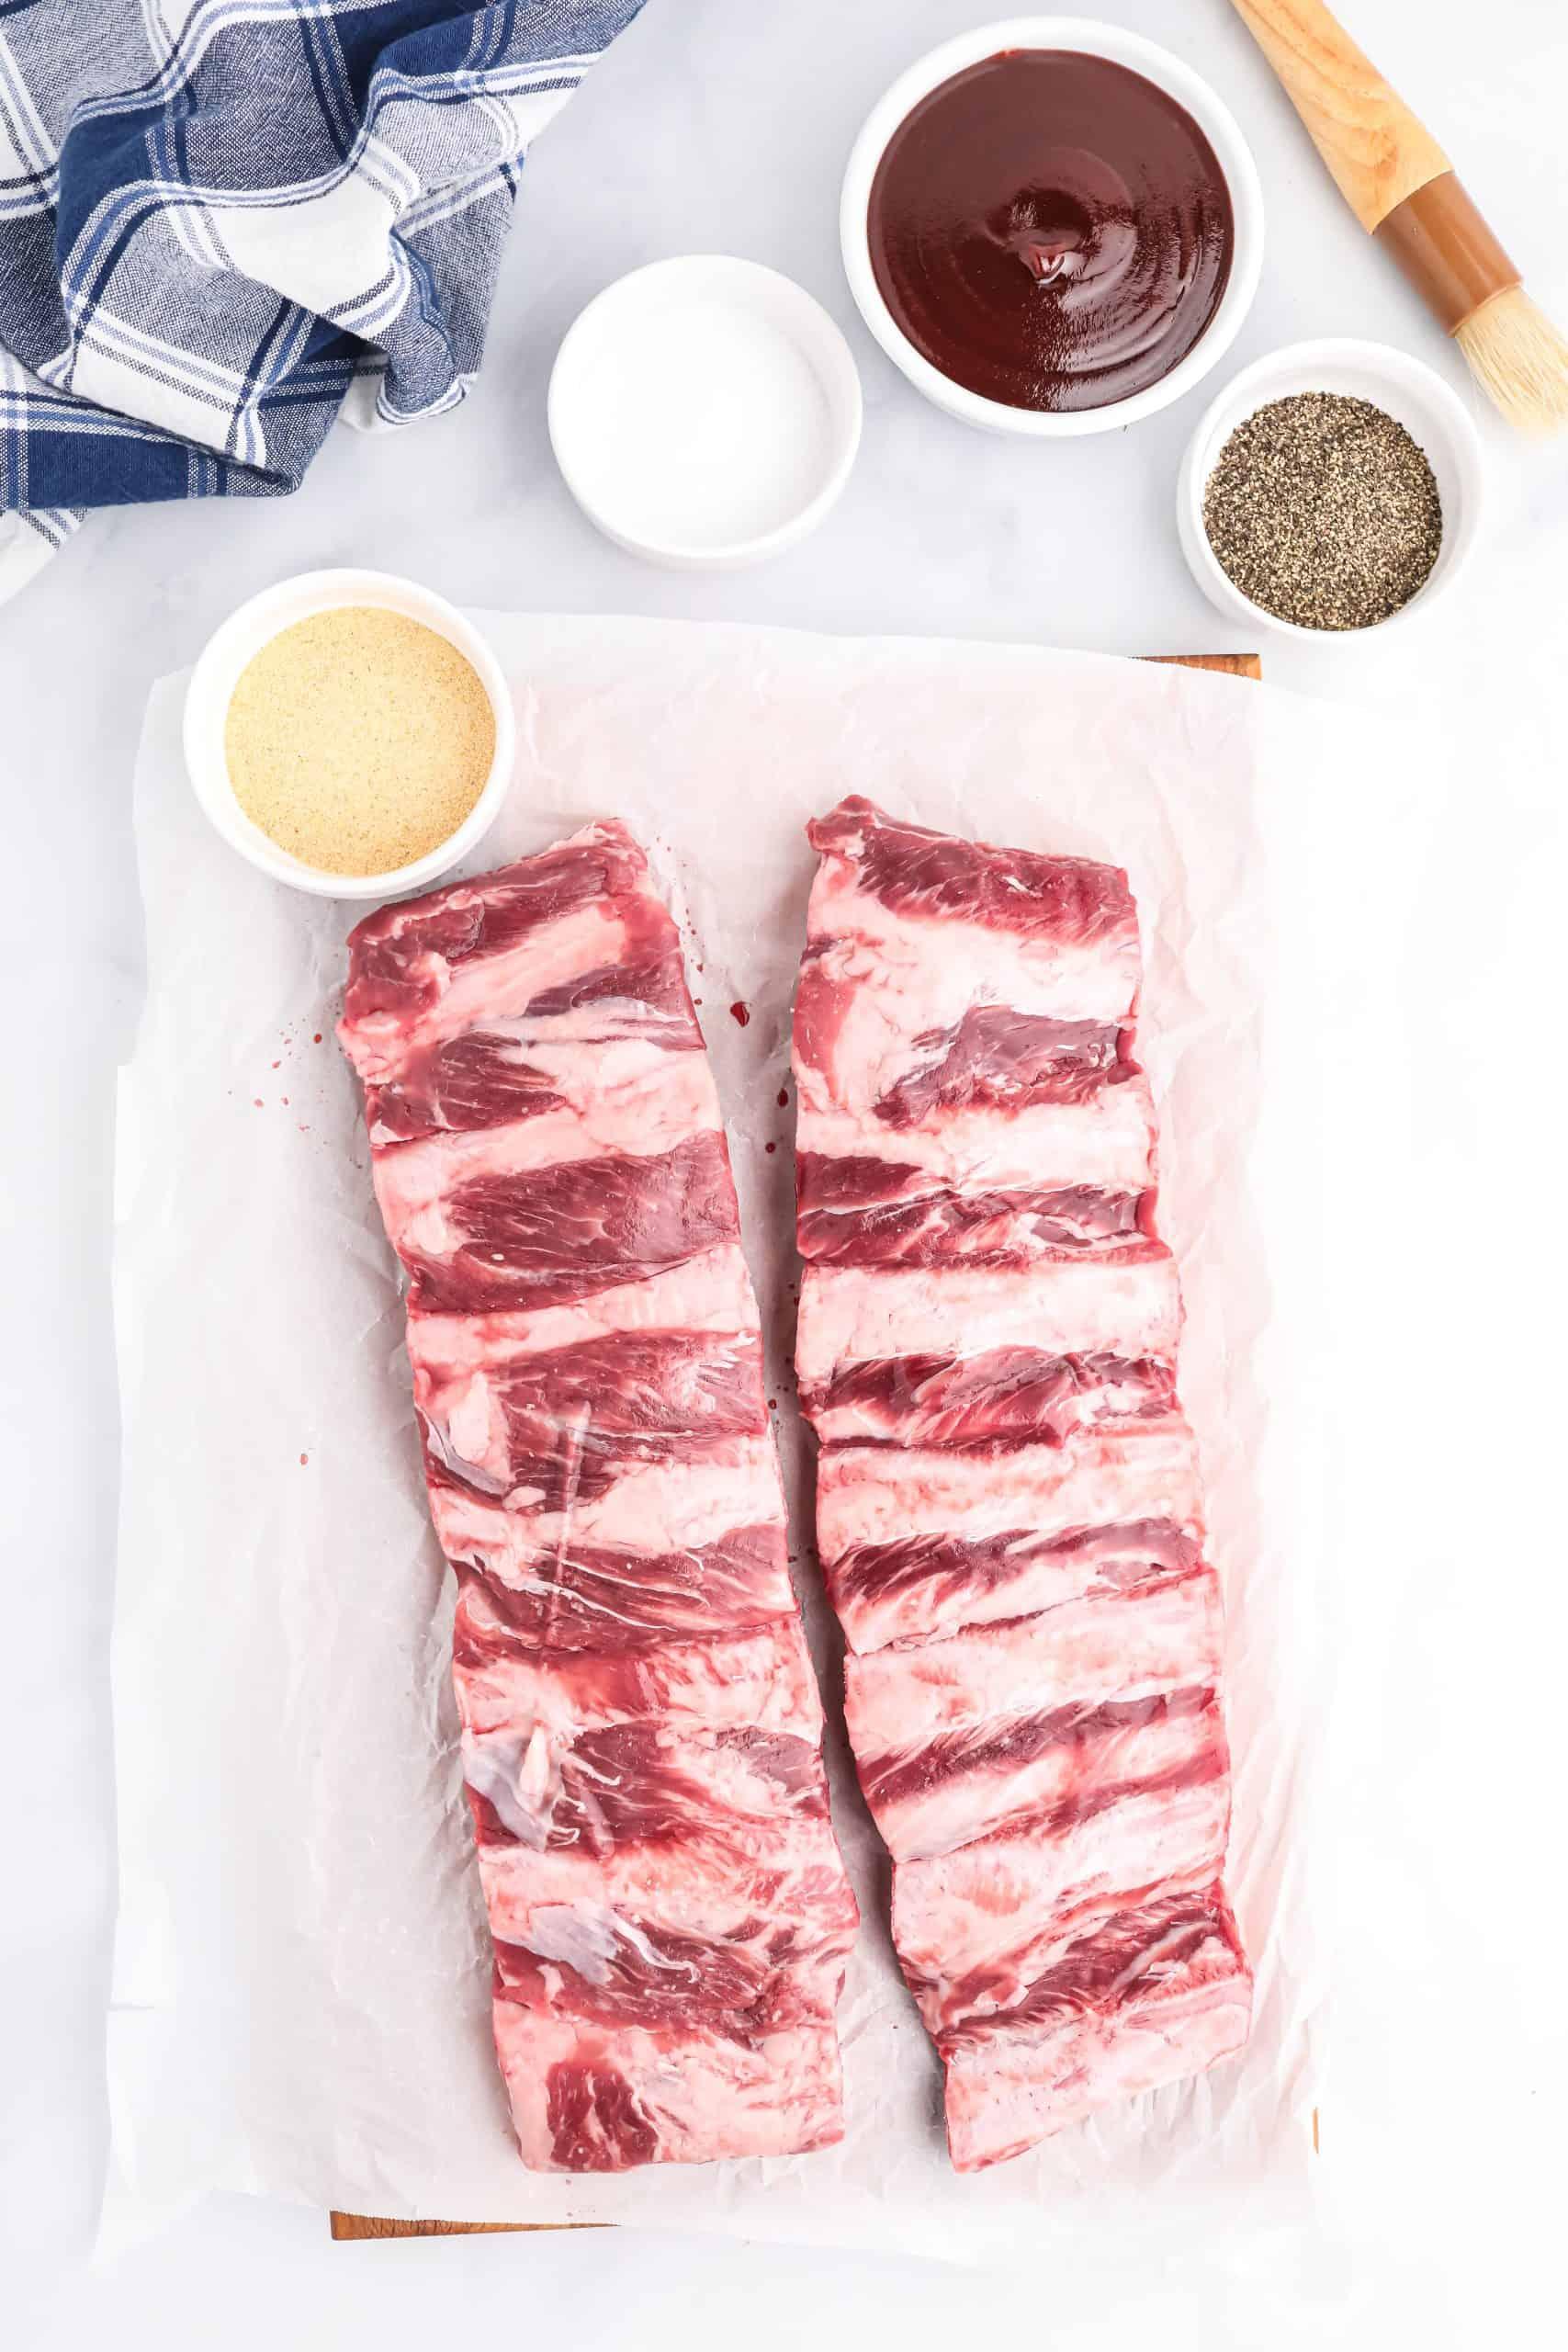 Ingredients needed: Beef ribs, salt, pepper, garlic powder, vinegar and bbq sauce.